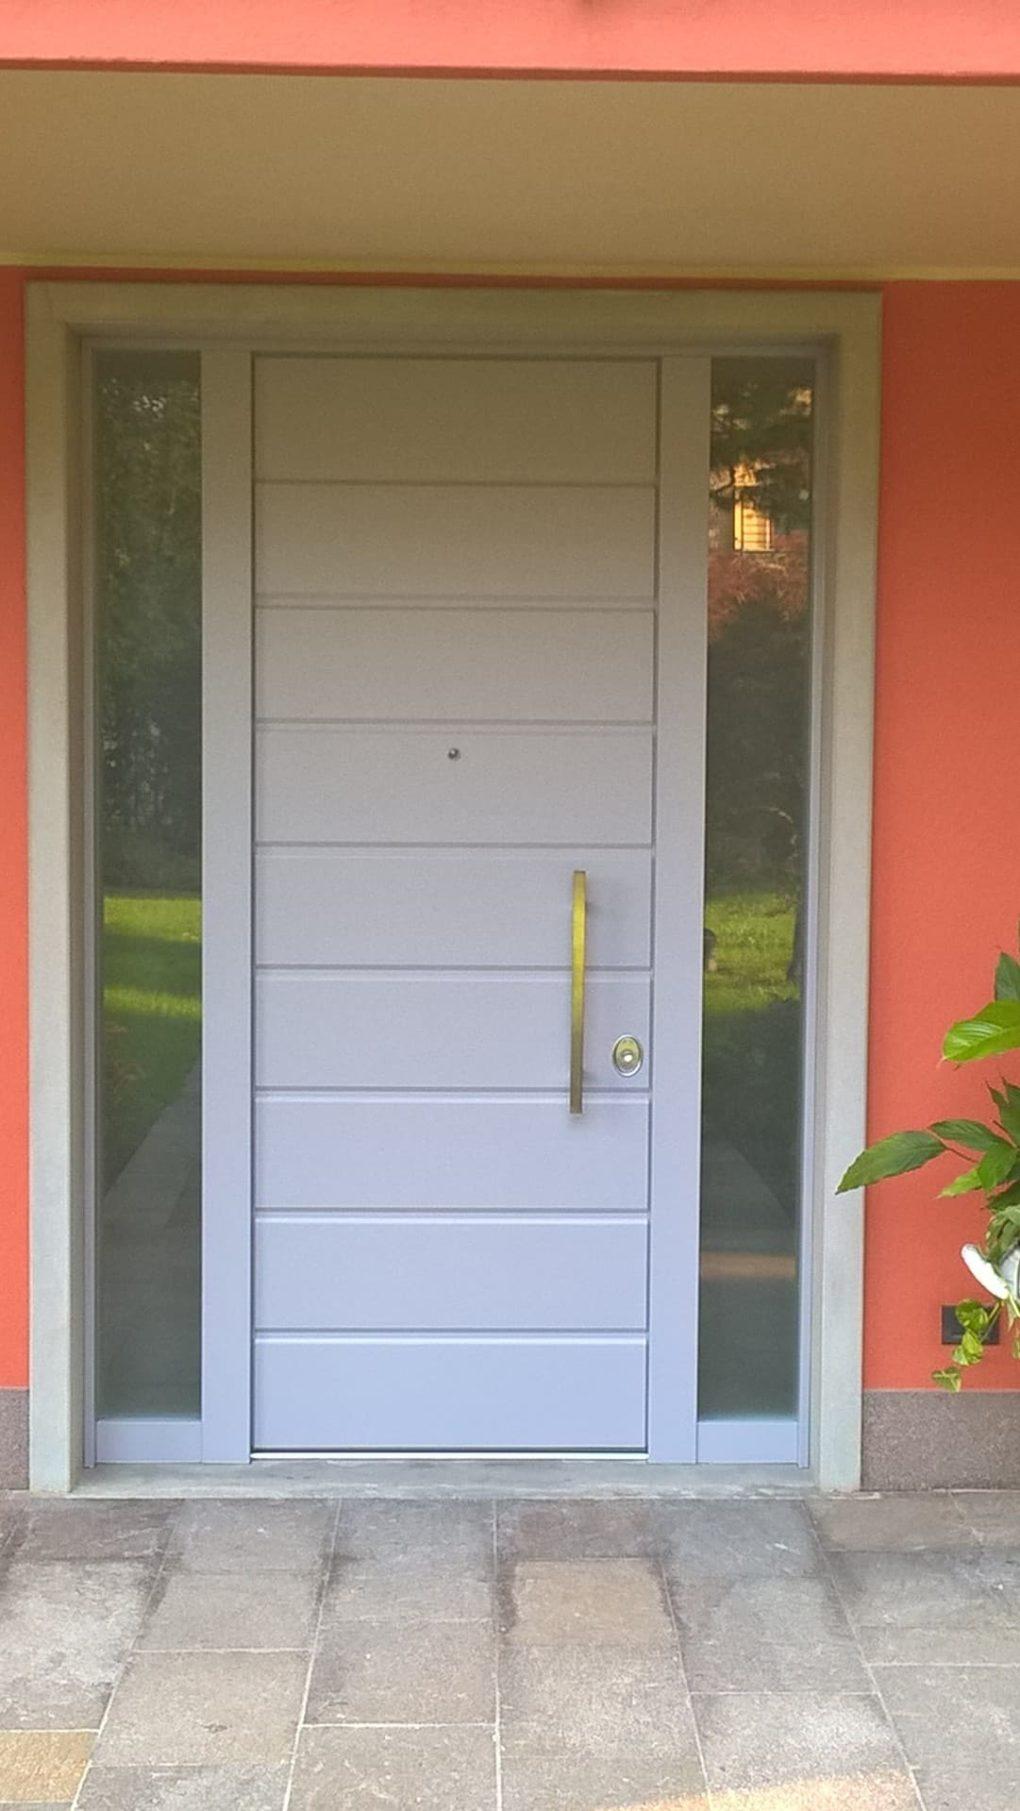 Sostituzione Porte Interne Detrazione porte interne padova prezzi - top cucina leroy merlin - top